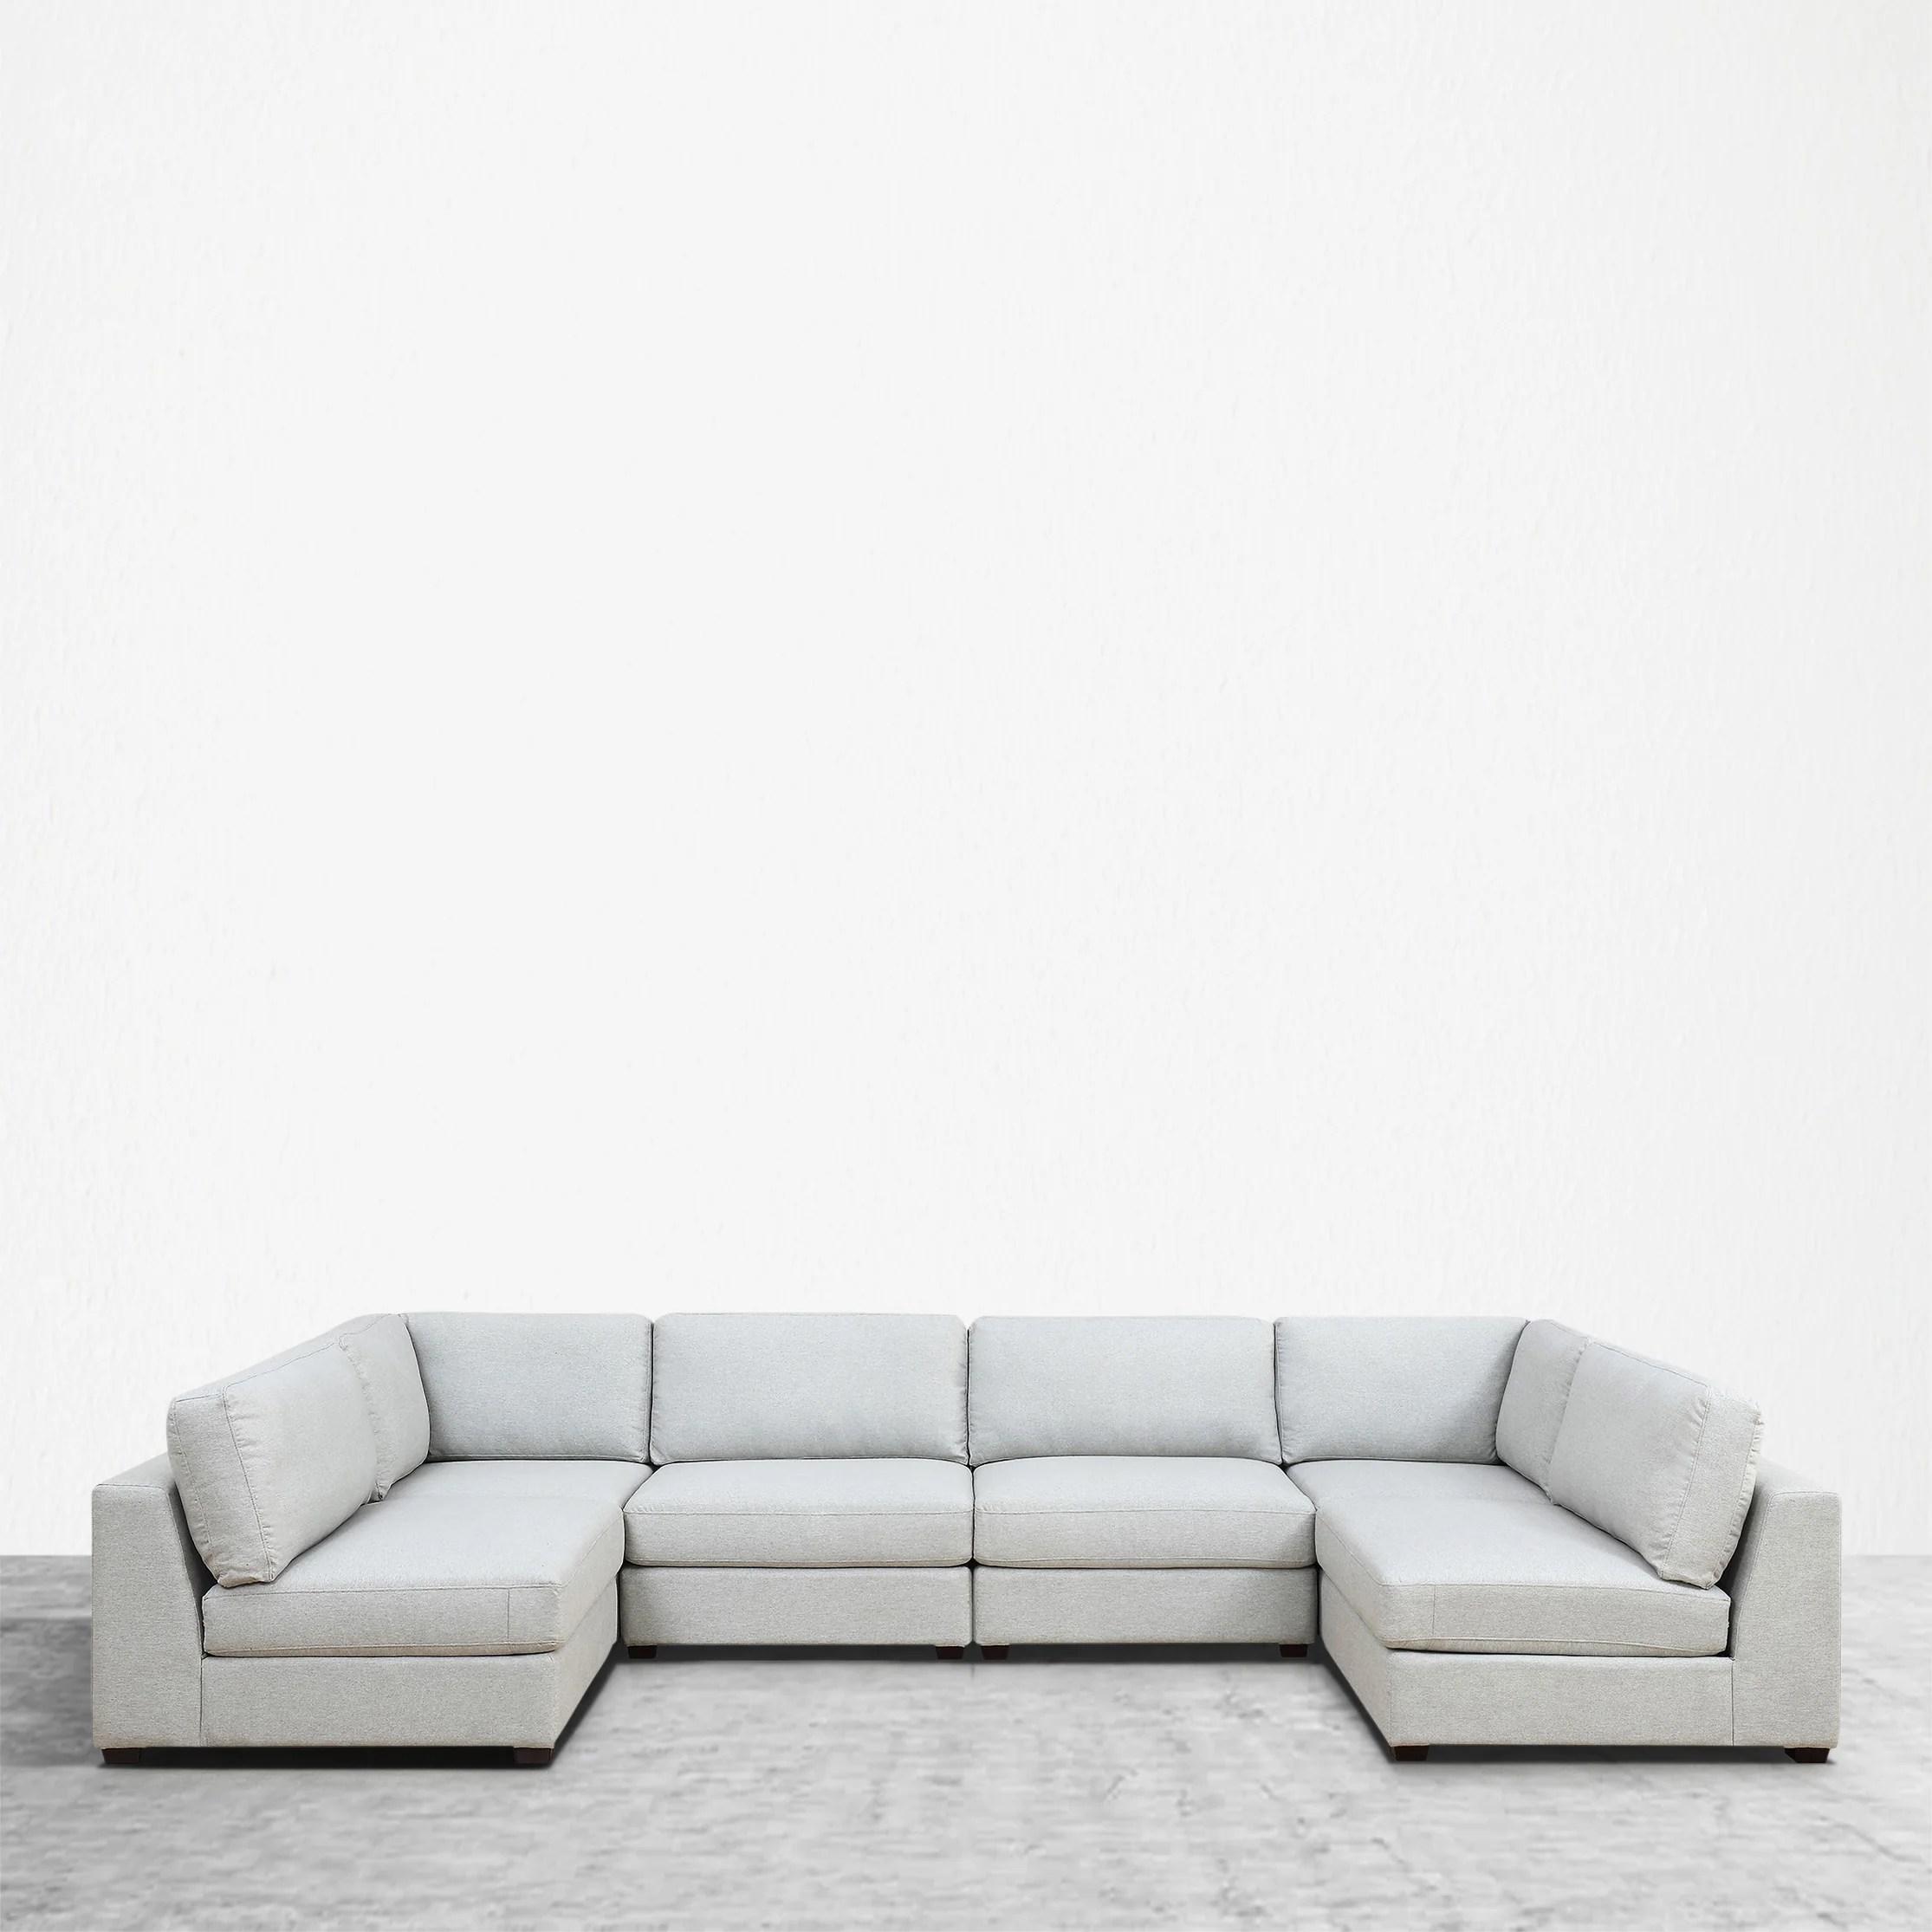 6 piece modular sectional sofa mattress pad for queen sleeper reed 6b deep seating